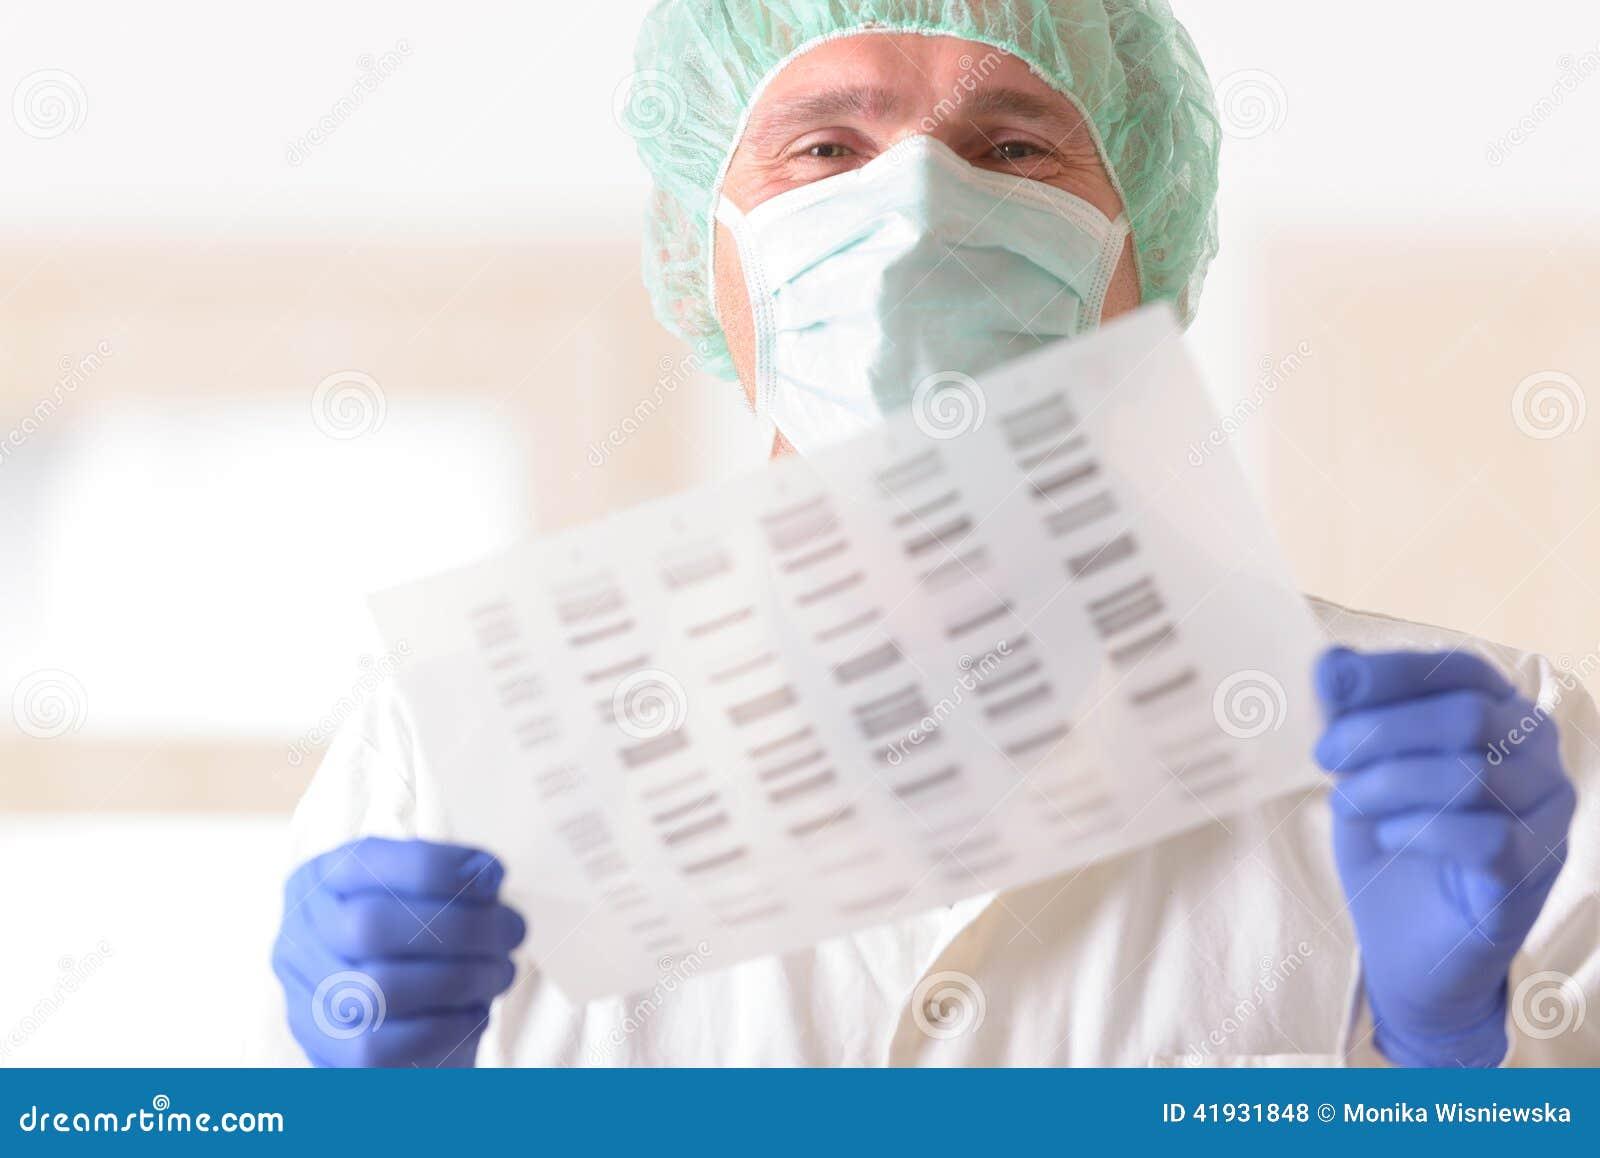 Analizing脱氧核糖核酸